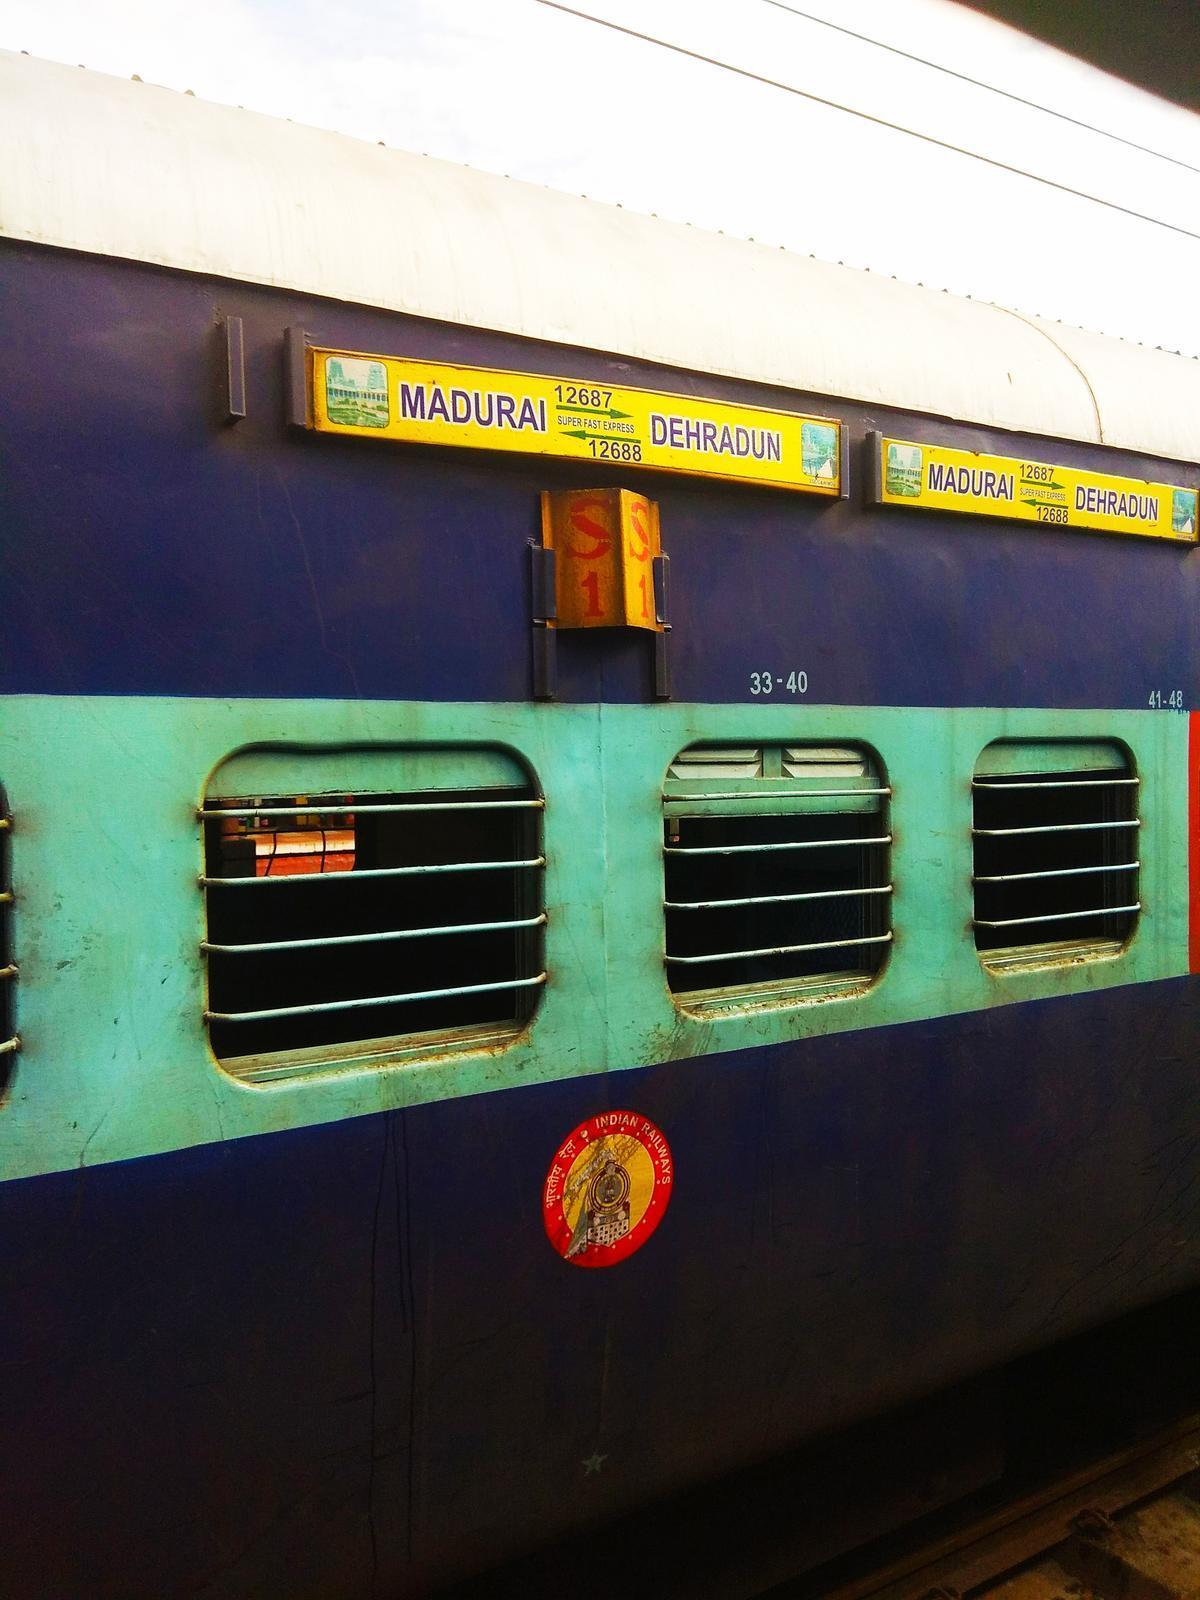 Madurai - Dehradun SF Express (PT)/12687 Travel Tips - Railway Enquiry